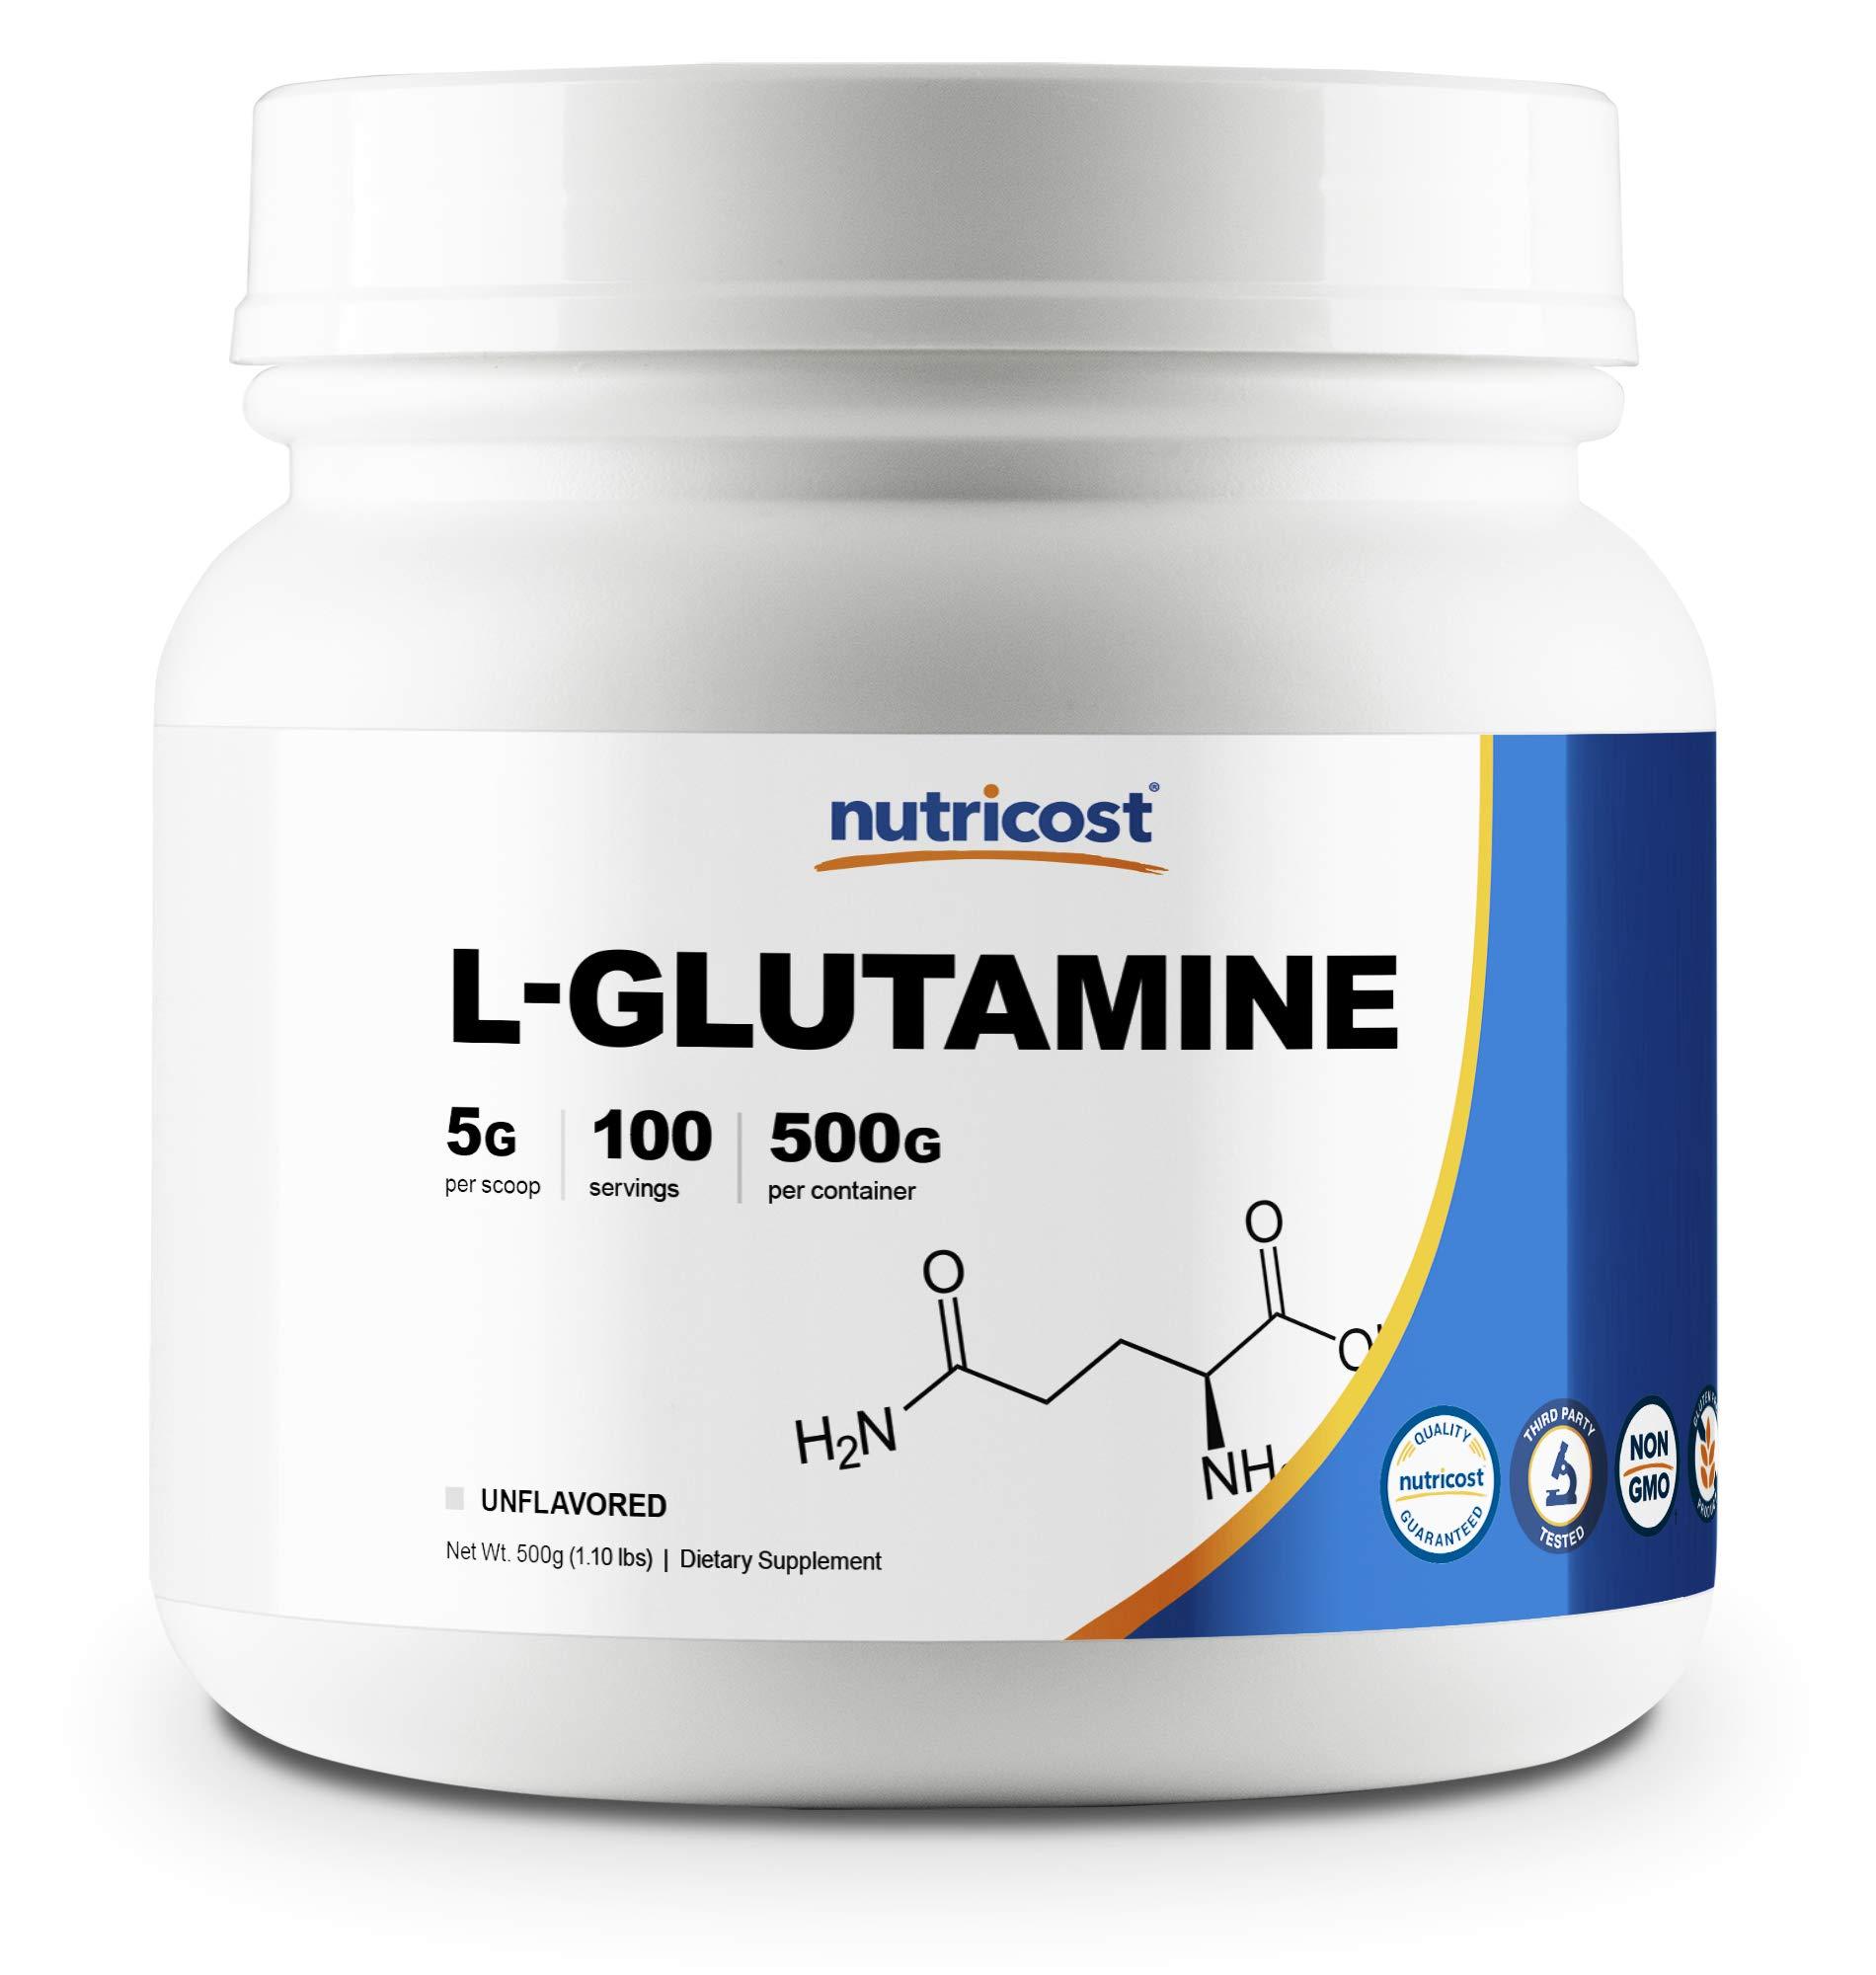 Nutricost L-Glutamine Powder (500 Grams) Unflavored - Gluten Free & Non-GMO by Nutricost